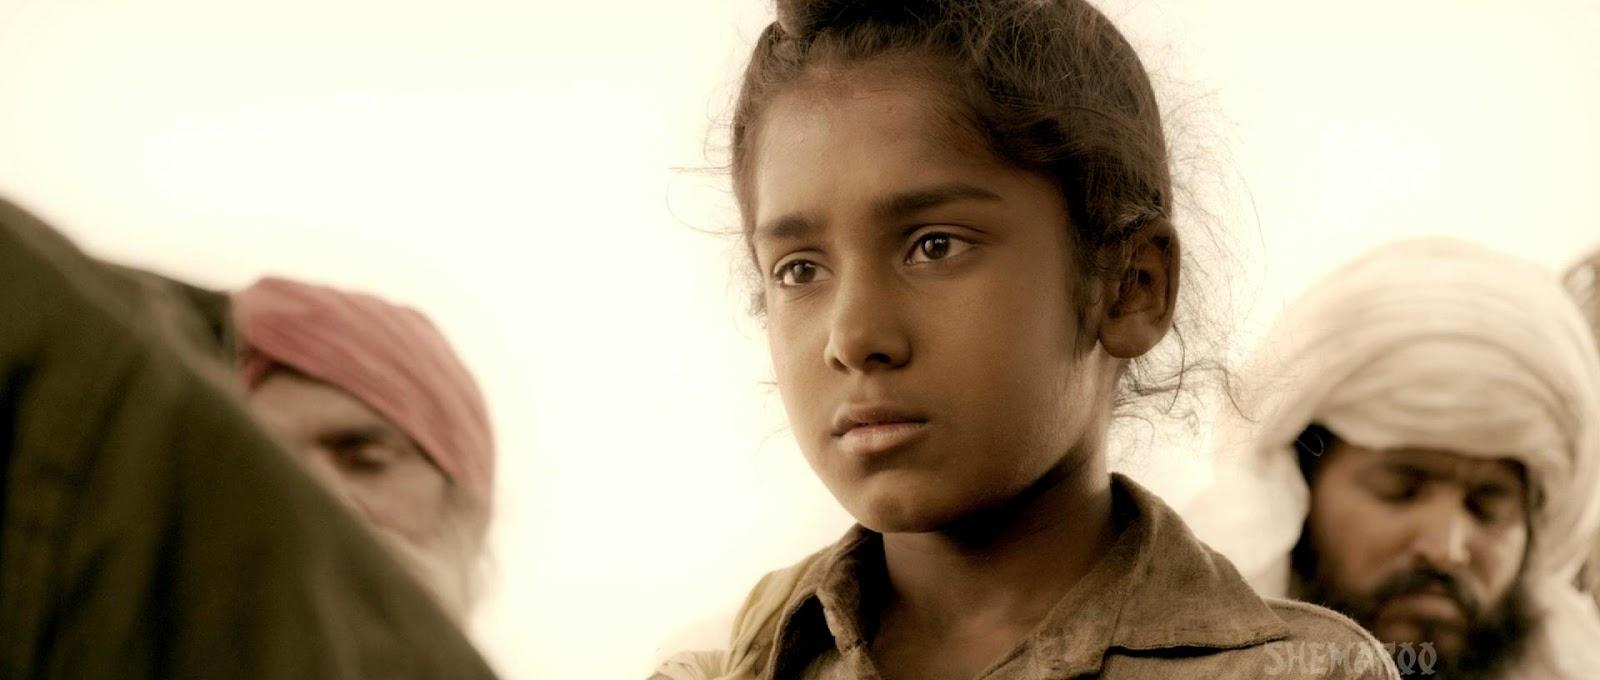 Bhaag Milkha Bhaag (2013) S3 s Bhaag Milkha Bhaag (2013)